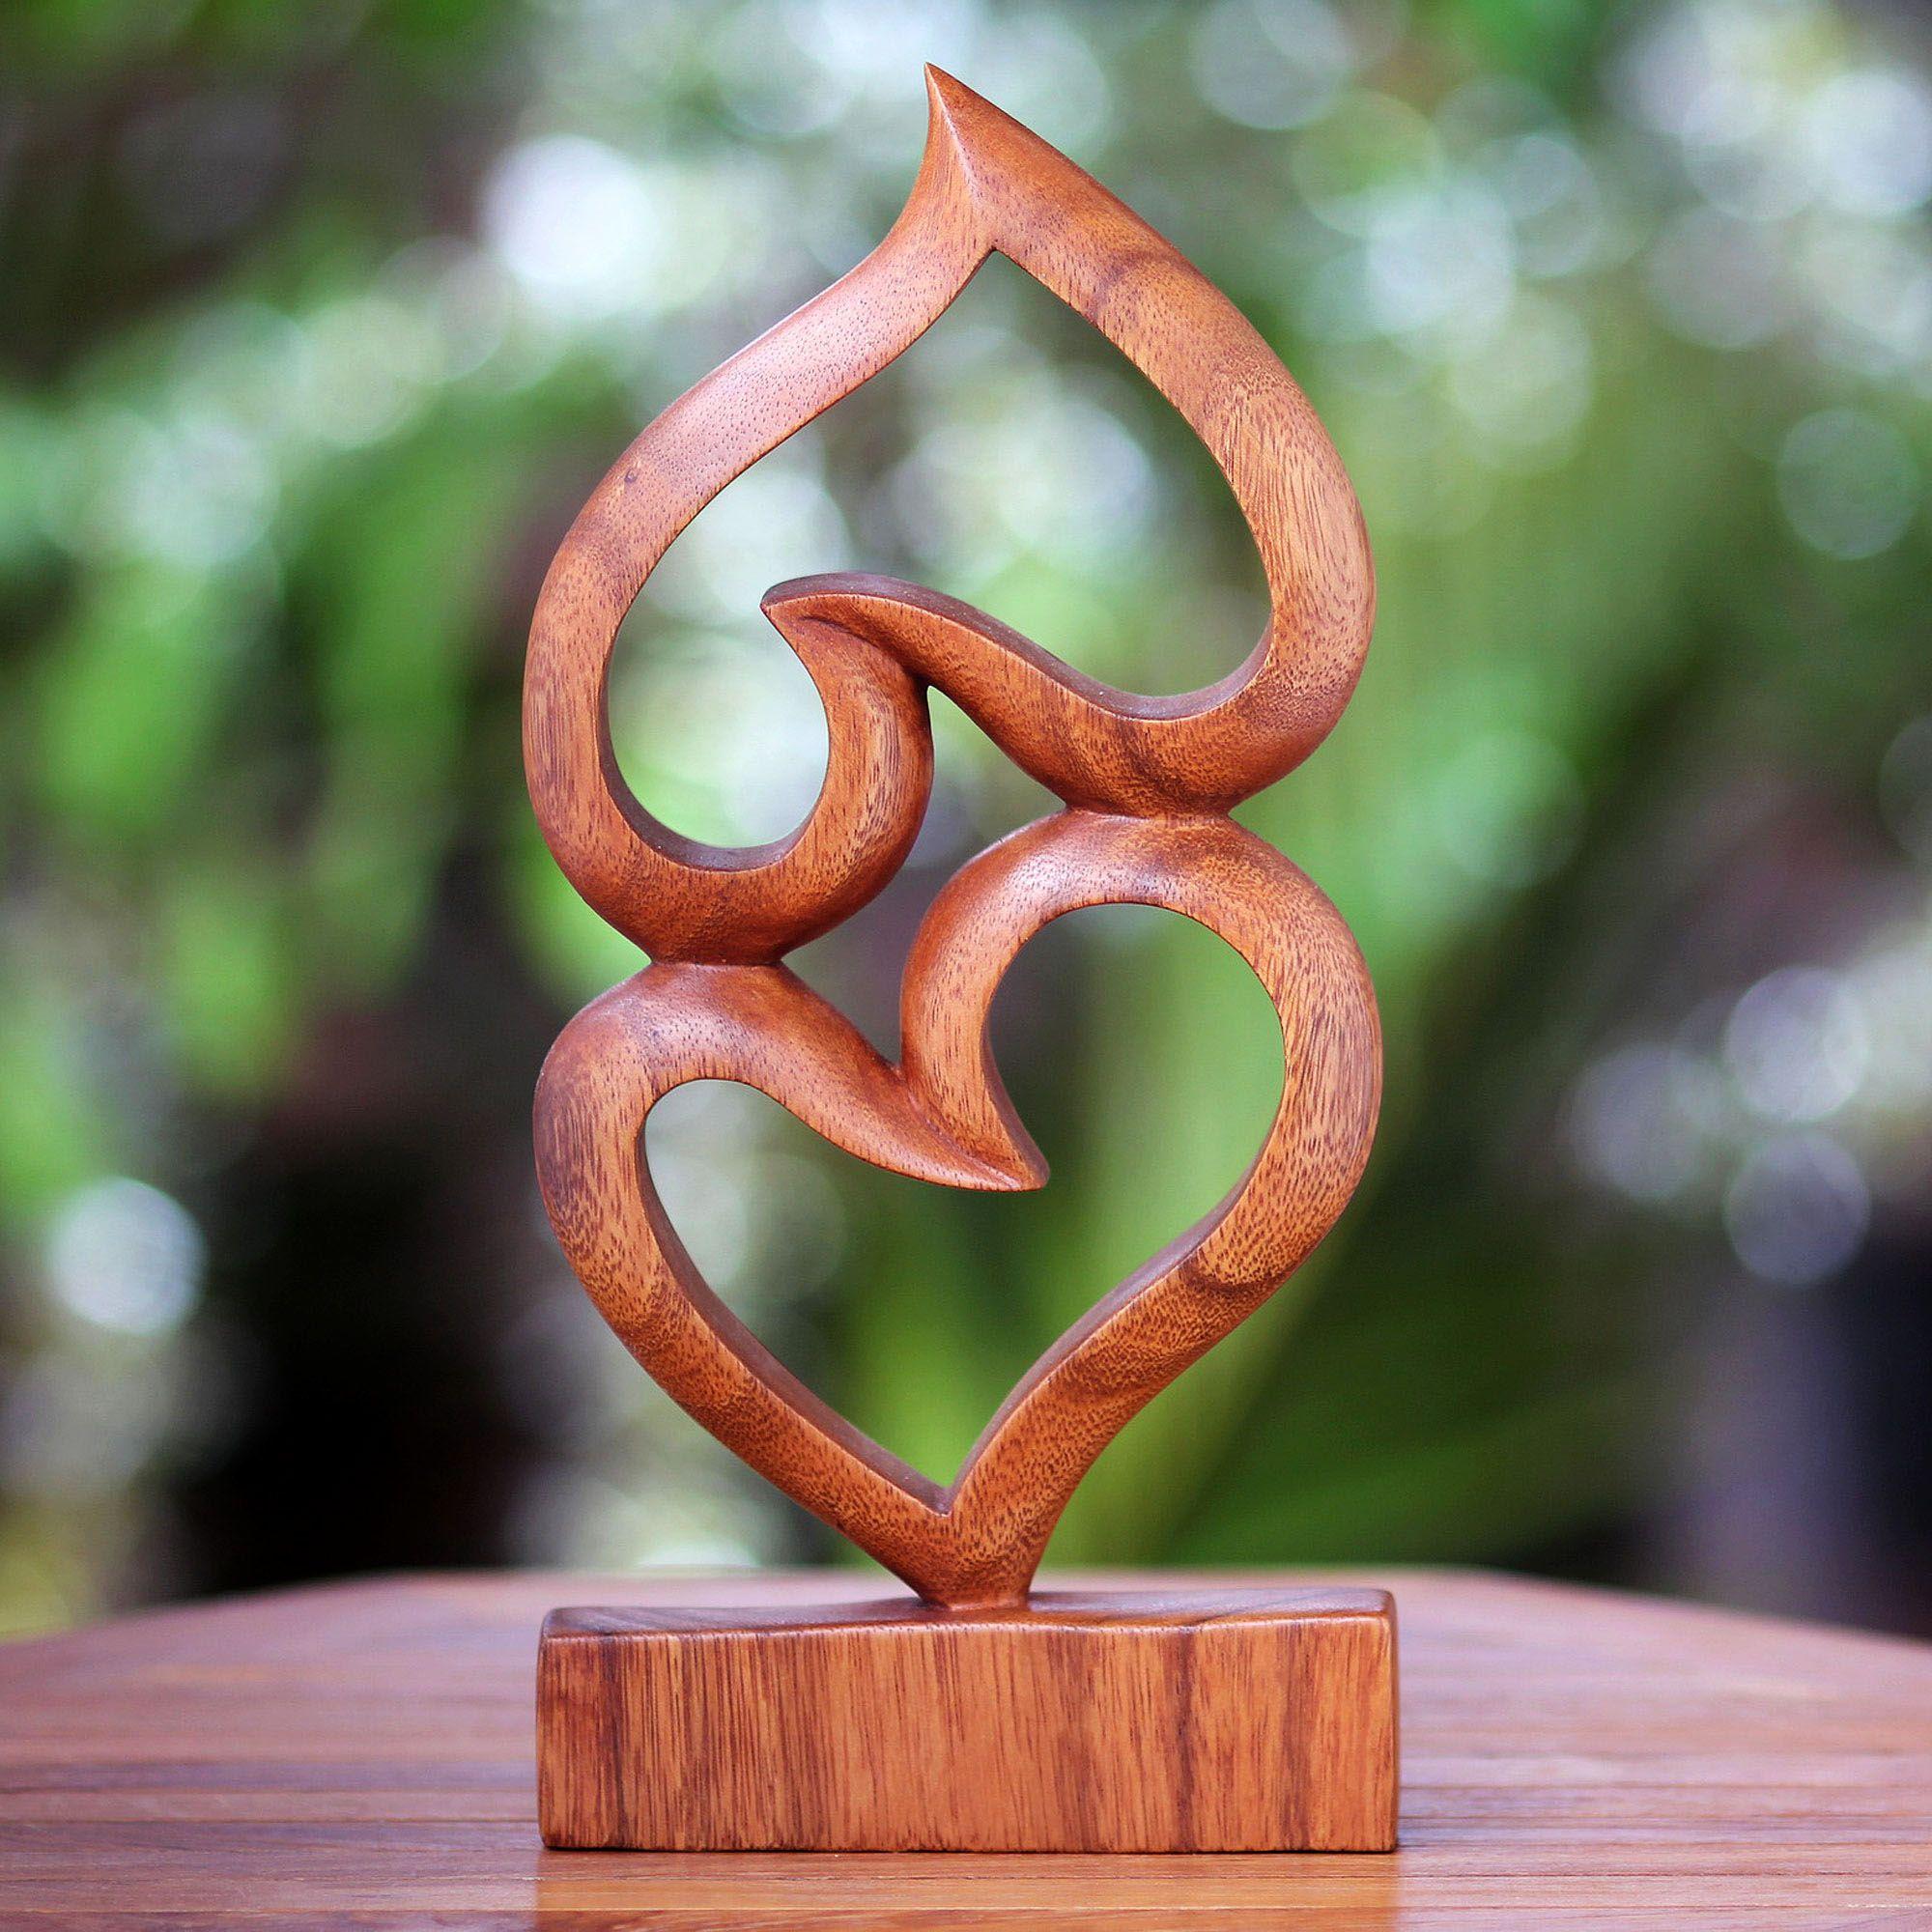 Suar Wood Heart Sculpture Upside Down Love Novica Wood Hearts Wood Carving Tools Wood Gifts